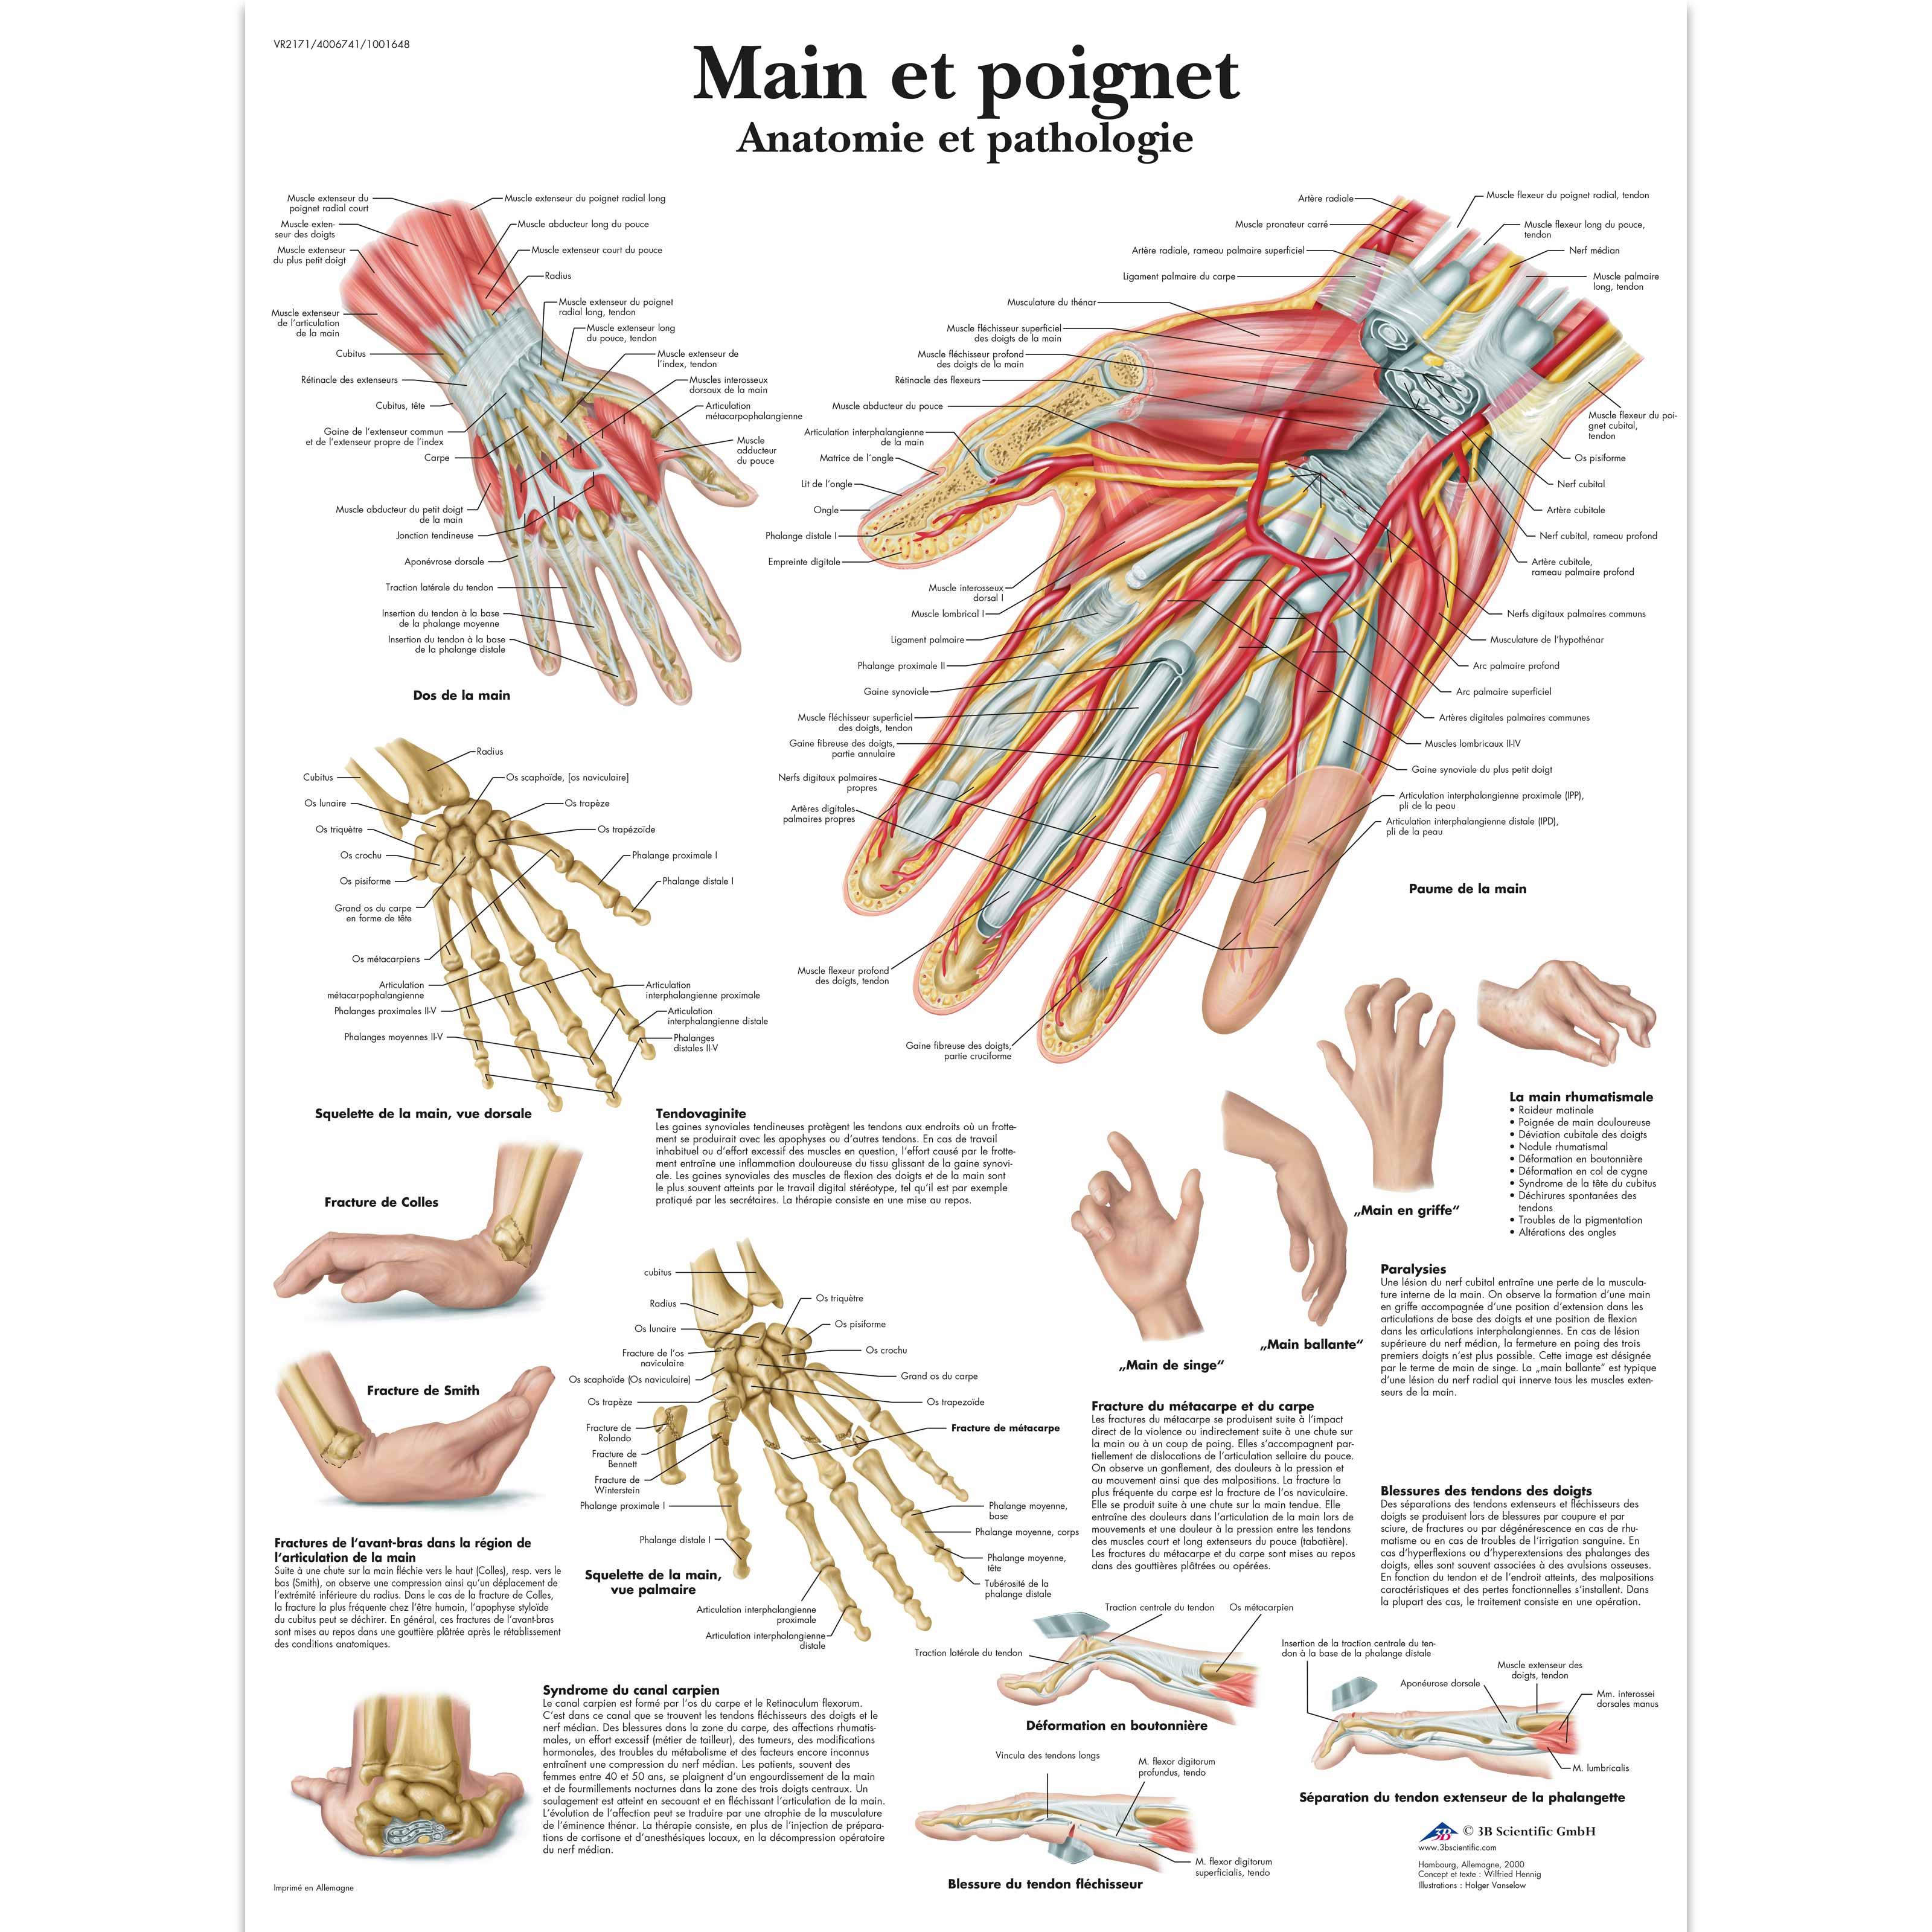 Main et poignet - Anatomie et pathologie - 4006741 - VR2171UU ...